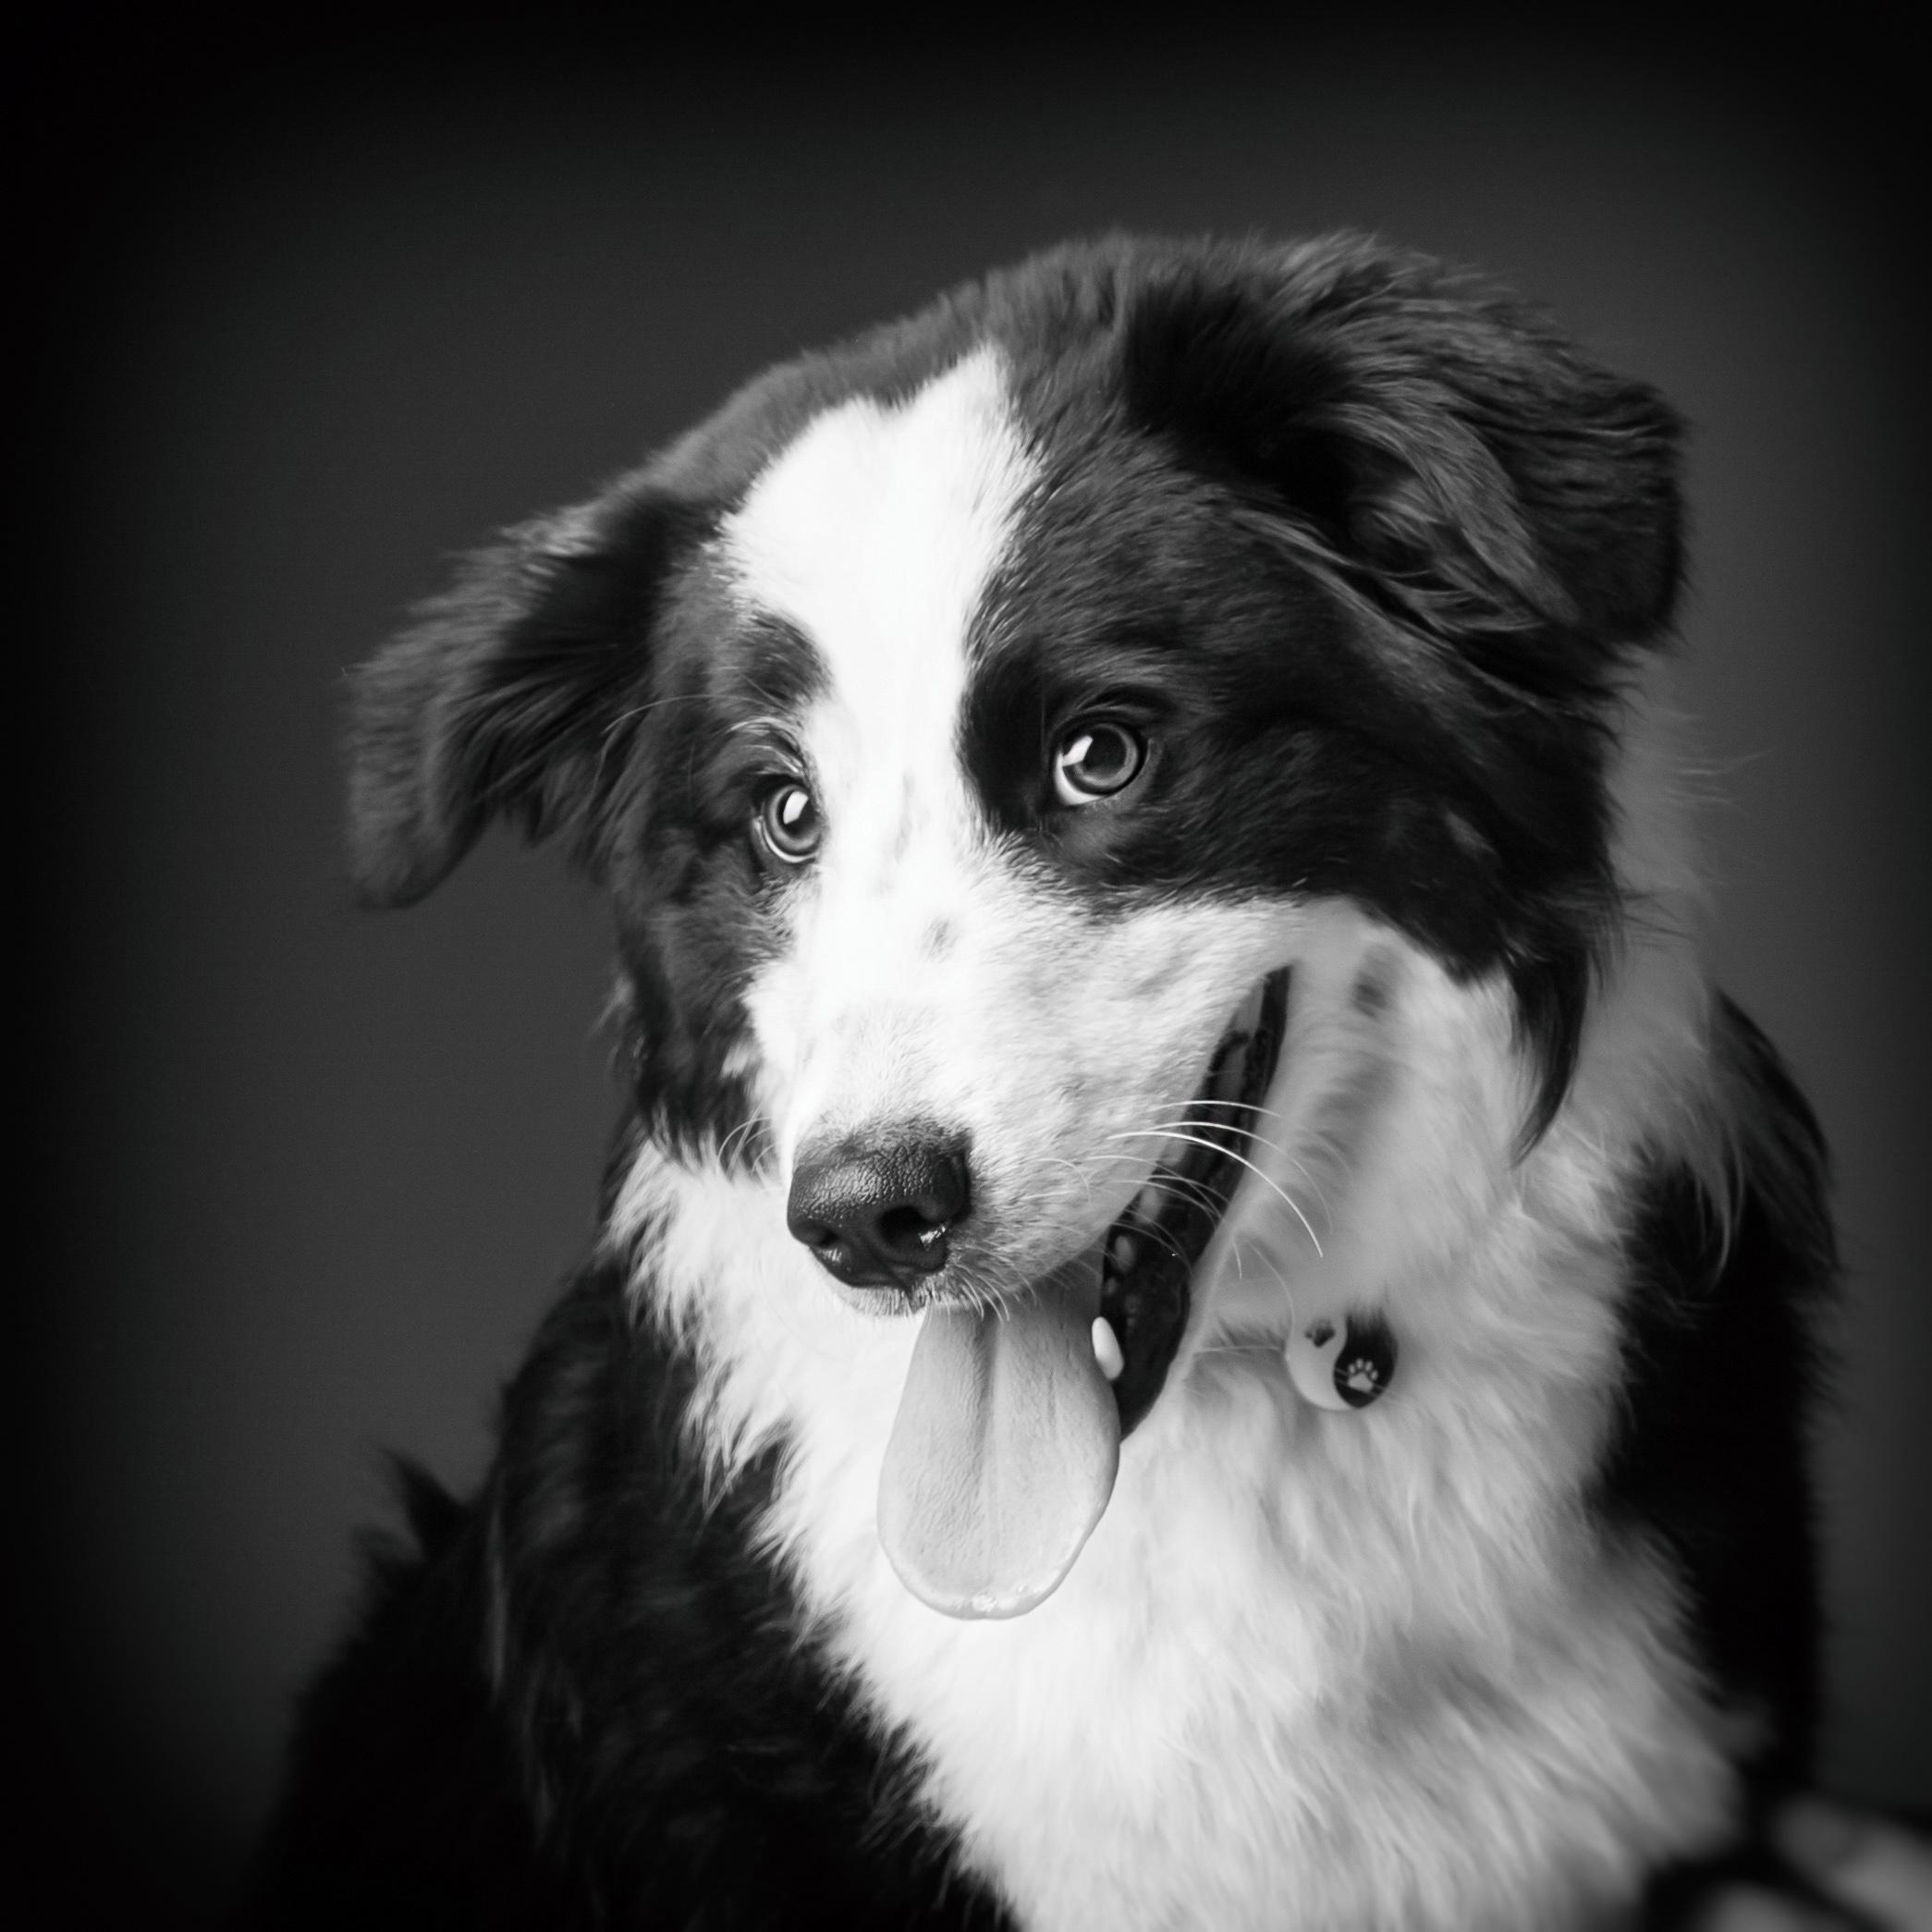 06 foto-gossos-celine-pech-andorra-0135